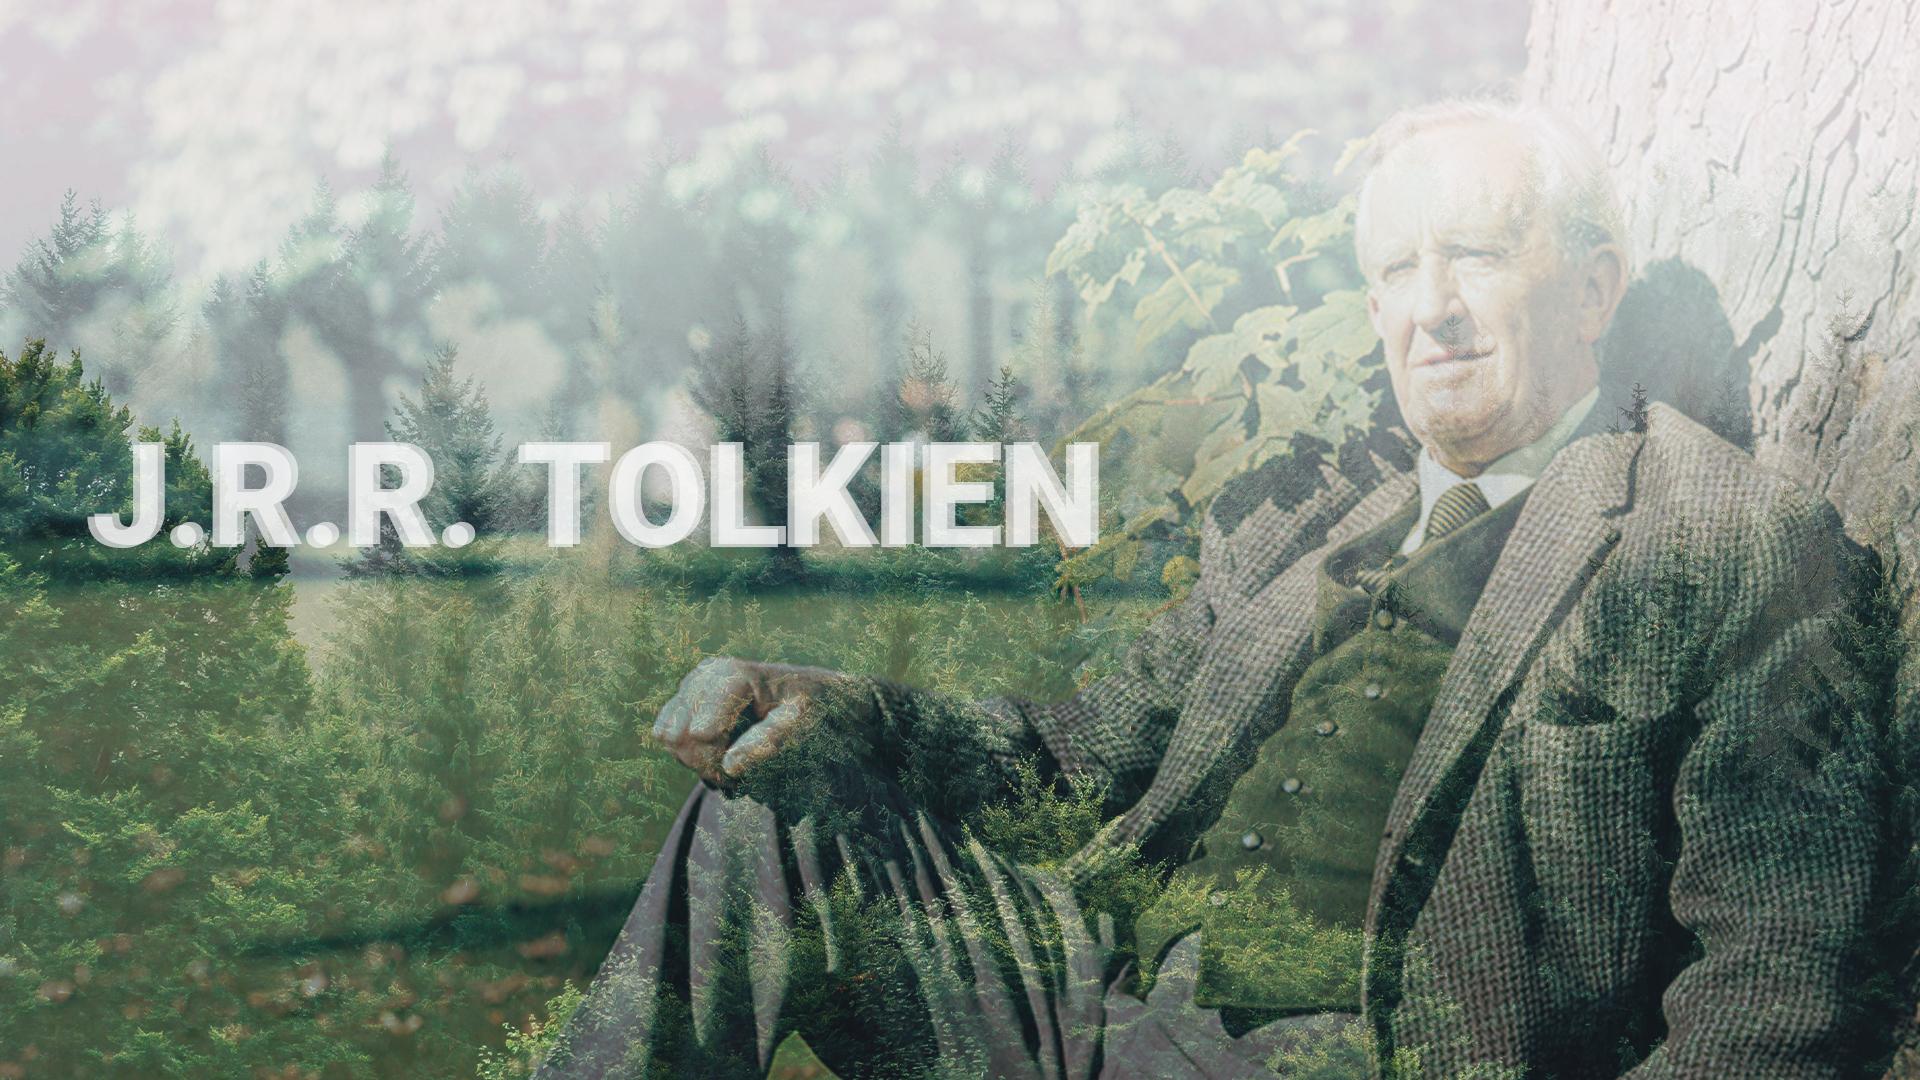 J.R.R. Tolkien, amante della natura